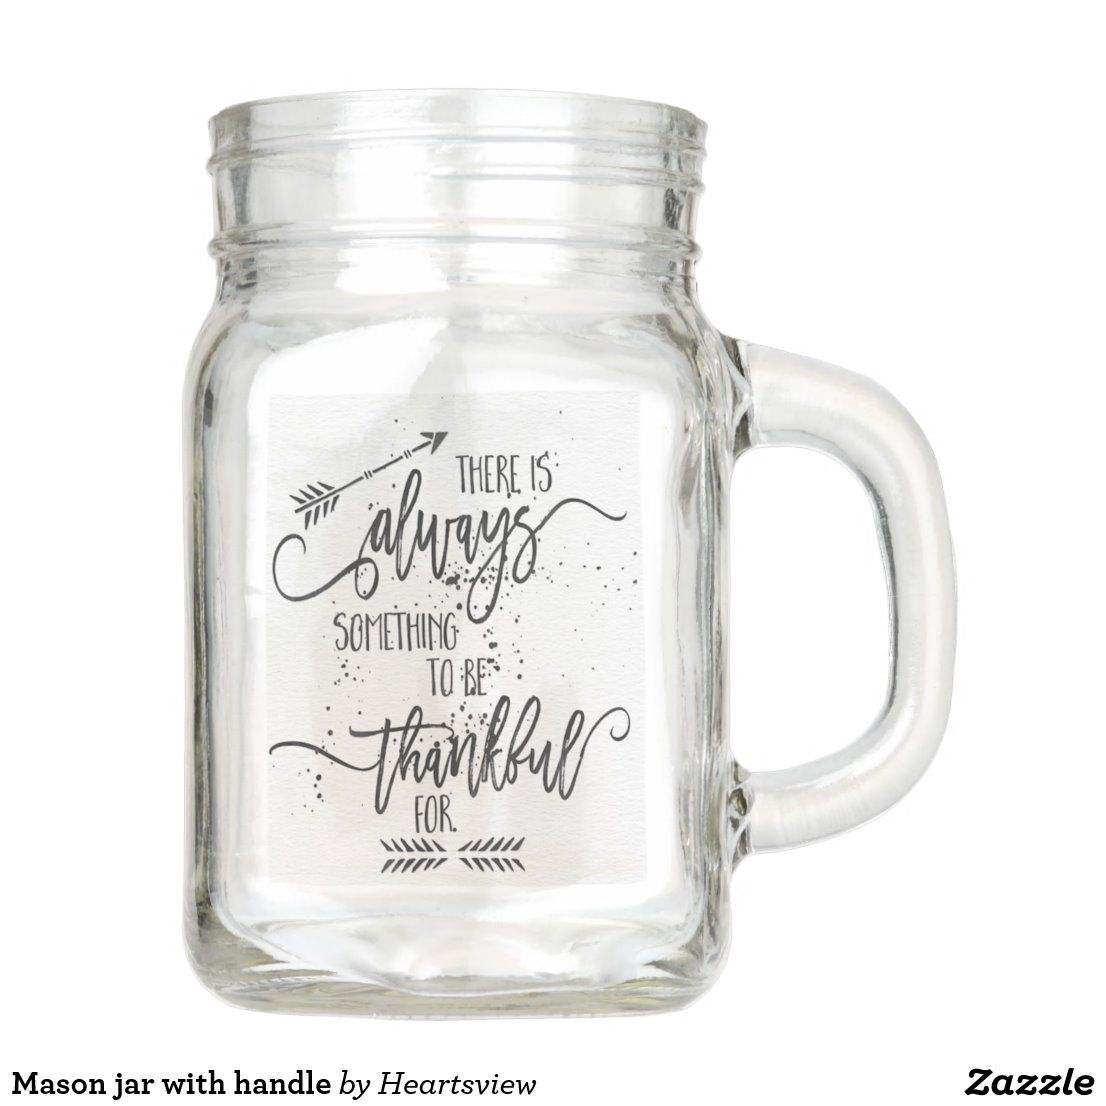 Mason Jar With Handle Zazzle Com In 2020 Mason Jar Wedding Favors Mason Jar Wedding Mason Jars